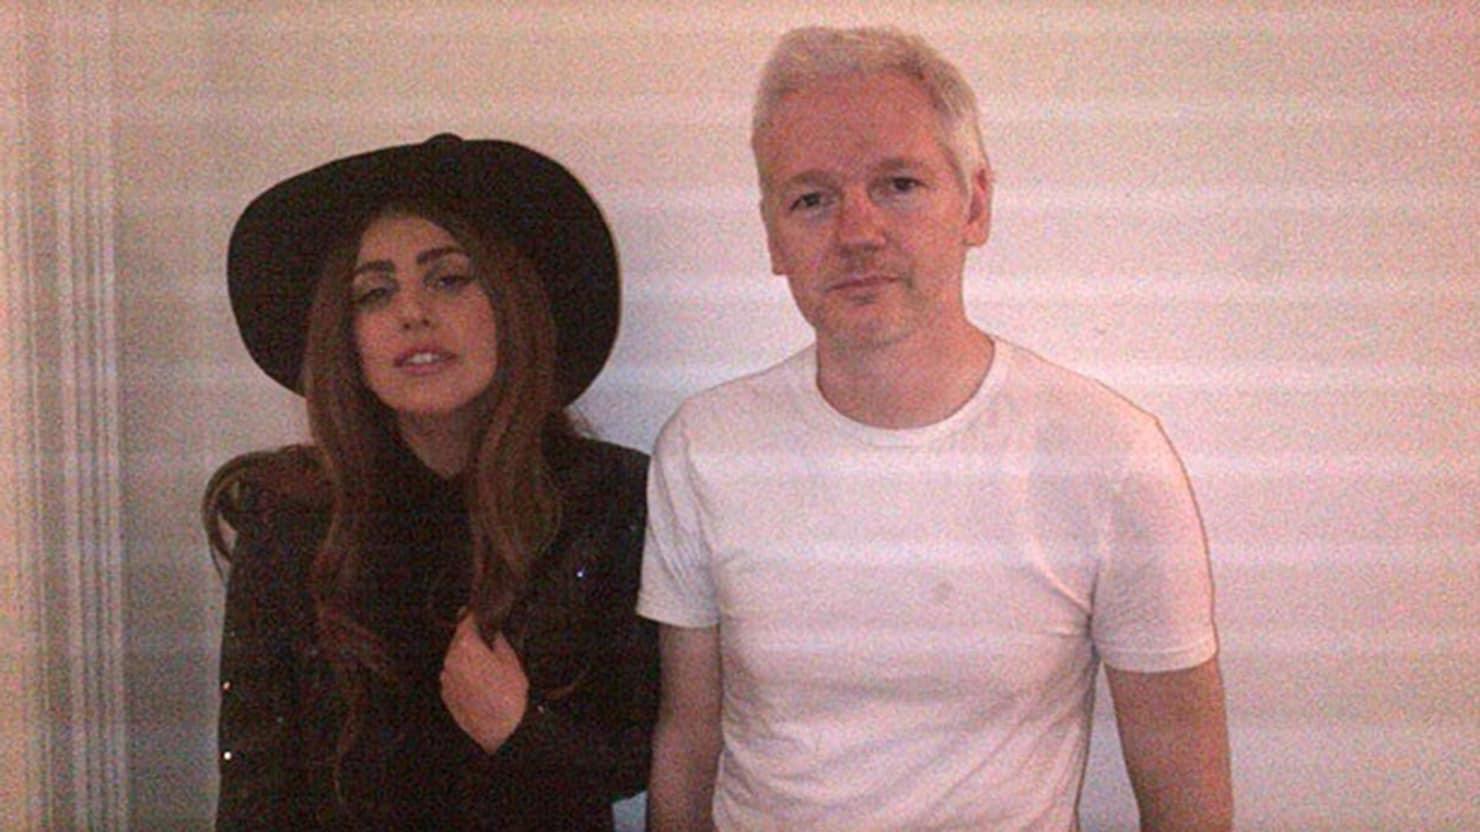 Julian Assange Interviewed by Lady Gaga